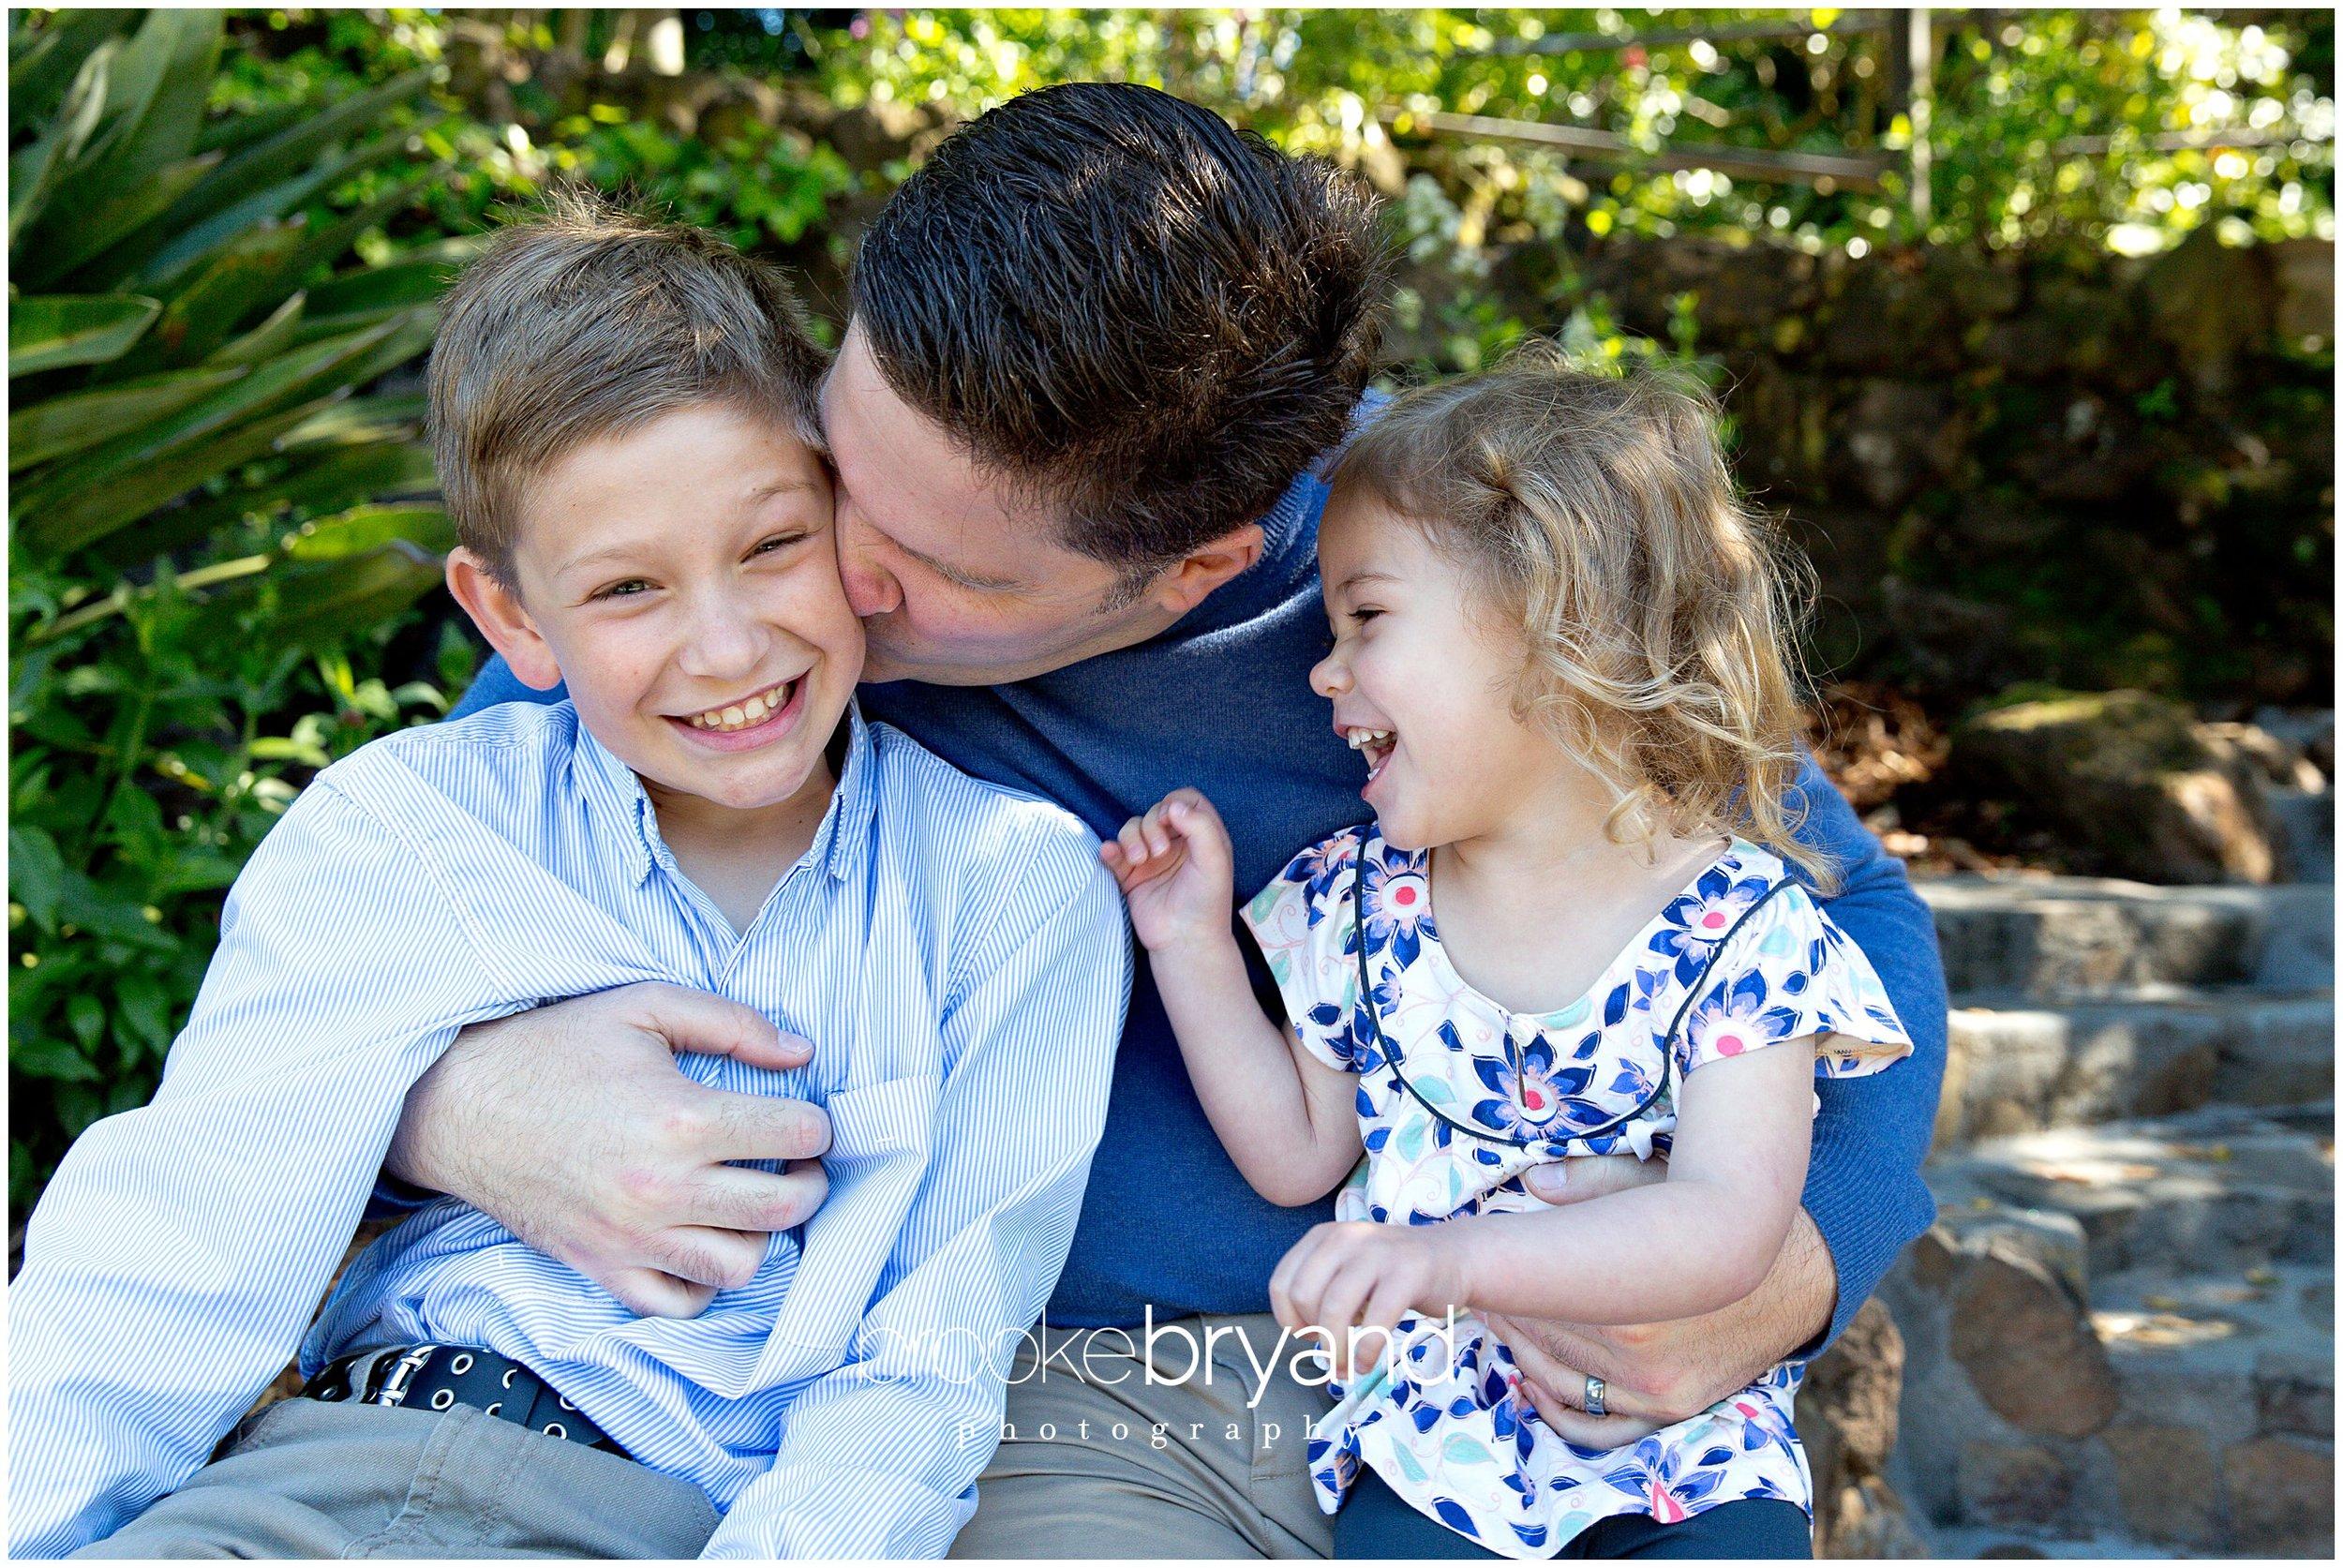 04.2014-Freitas-BBP_6291_San-Francisco-Family-Photos-Brooke-Bryand-Photography.jpg